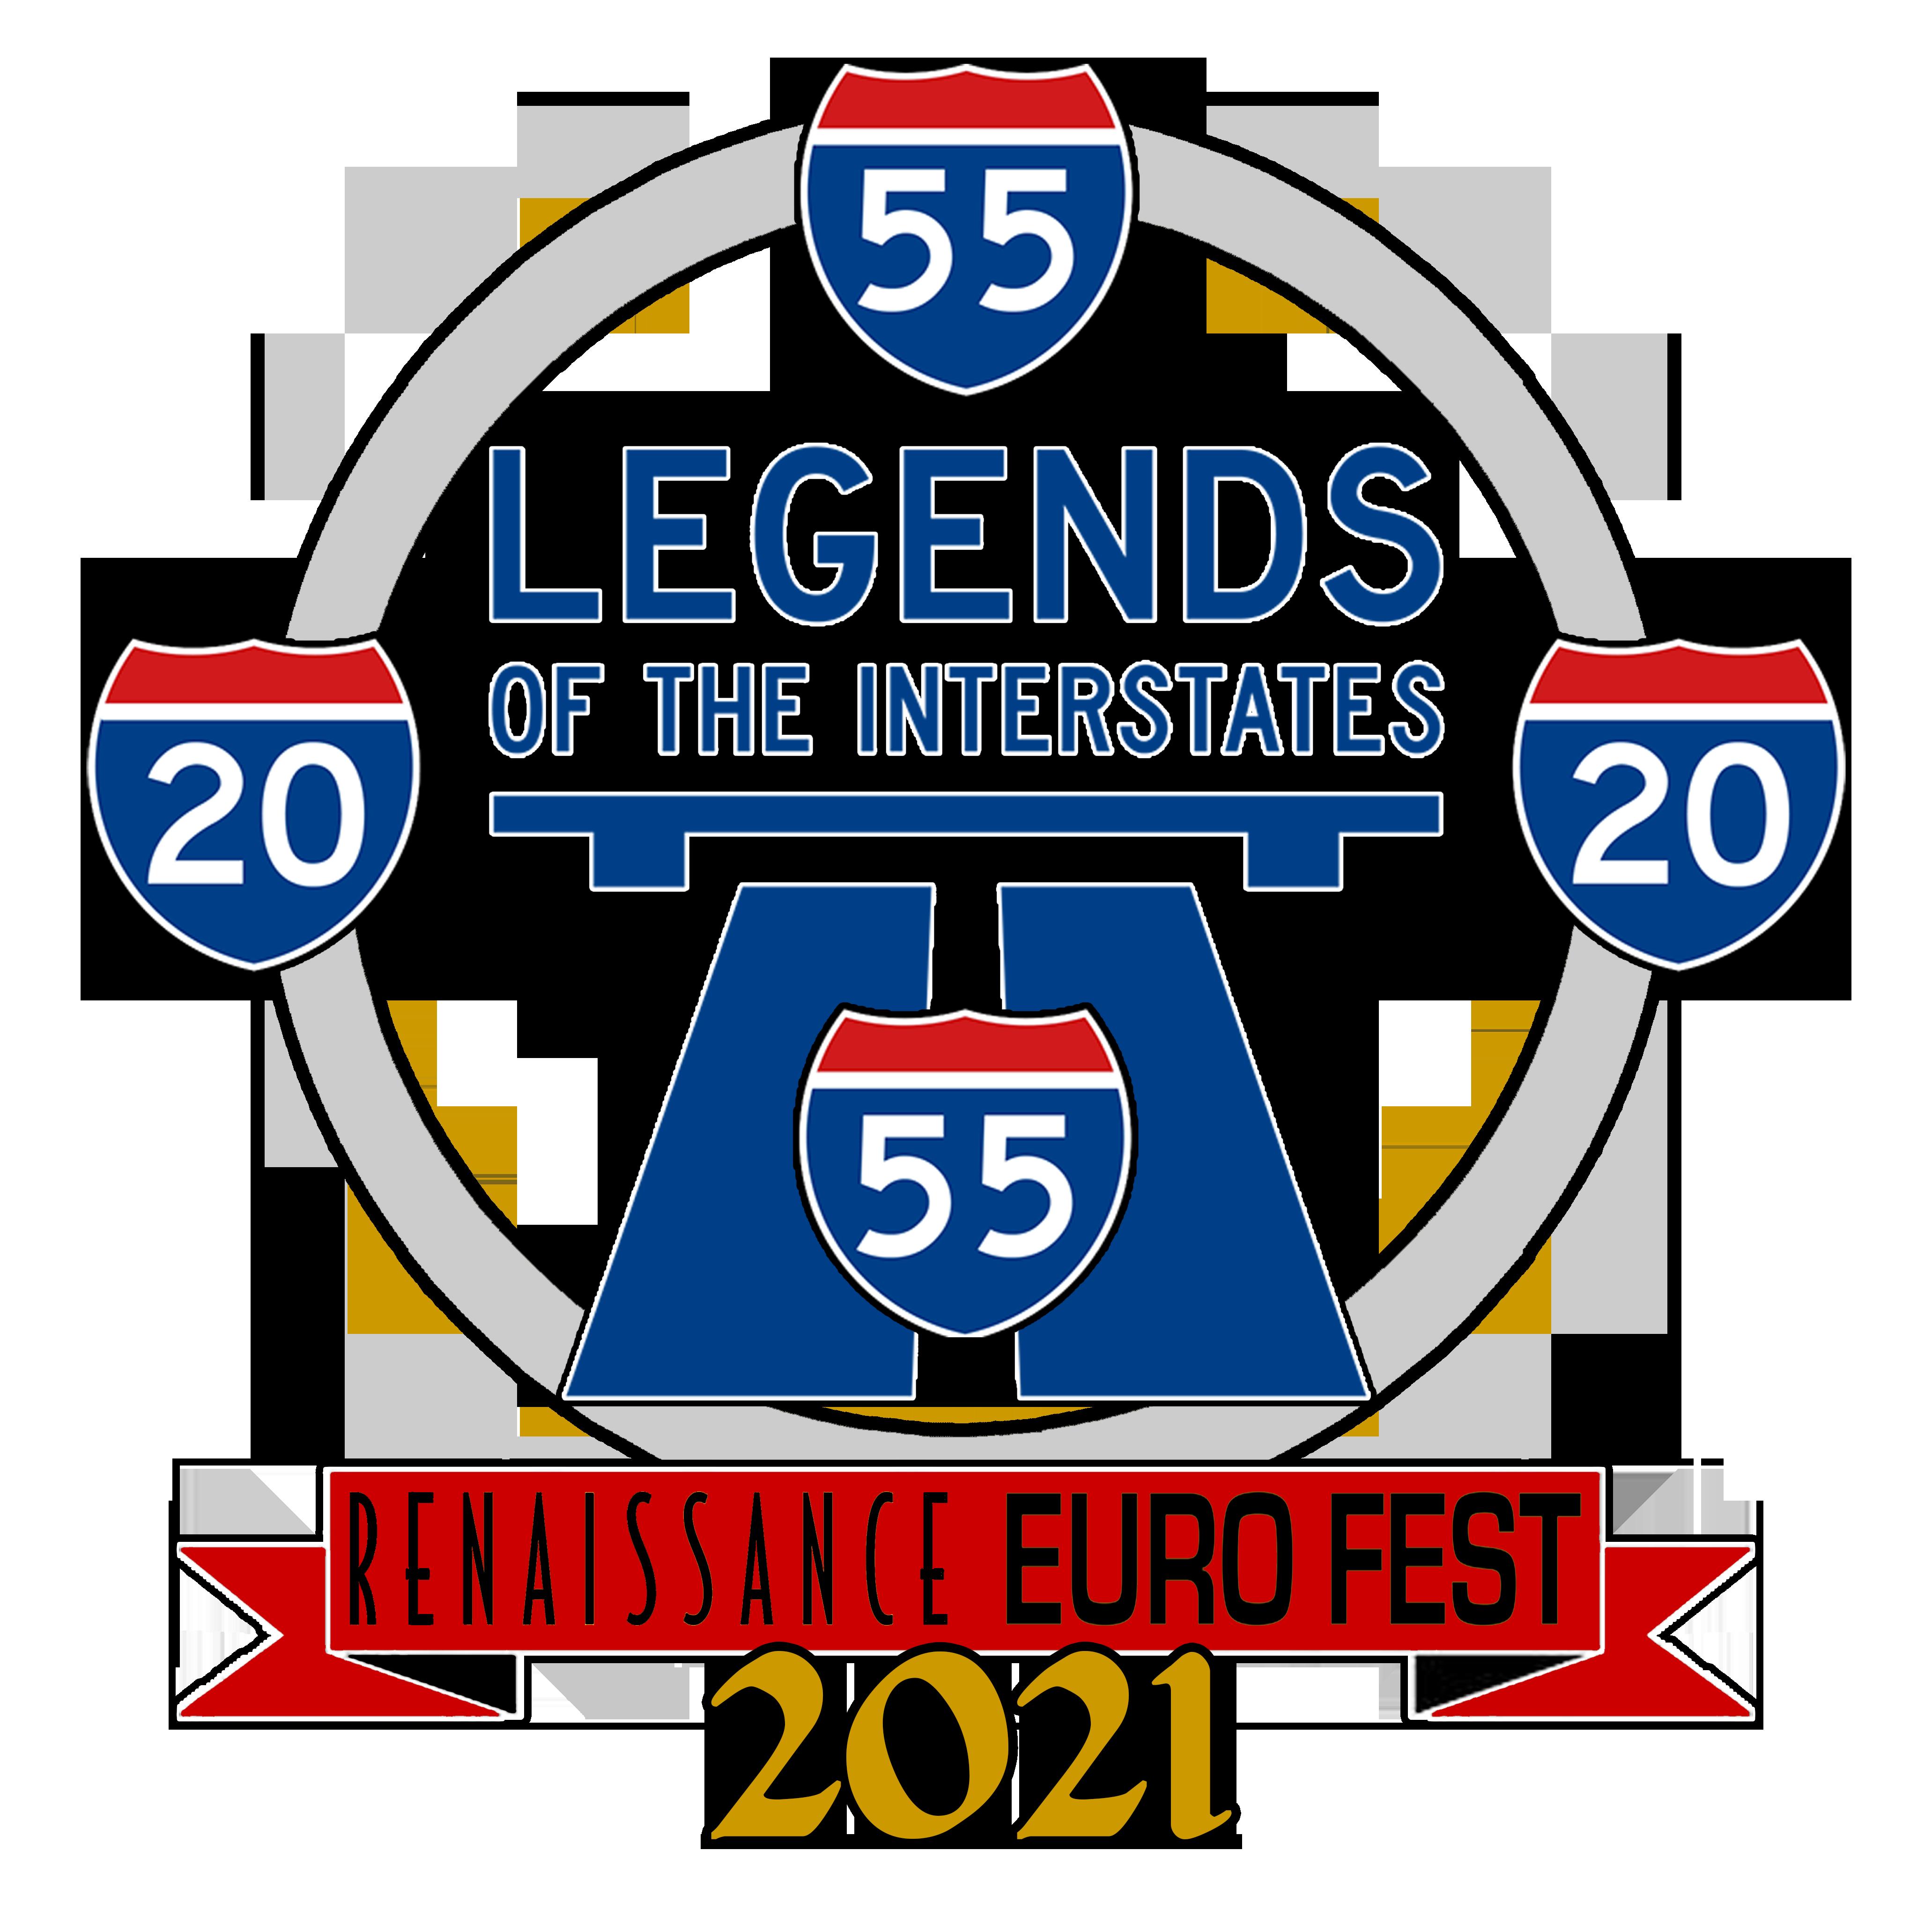 Legends of the Interstate logo